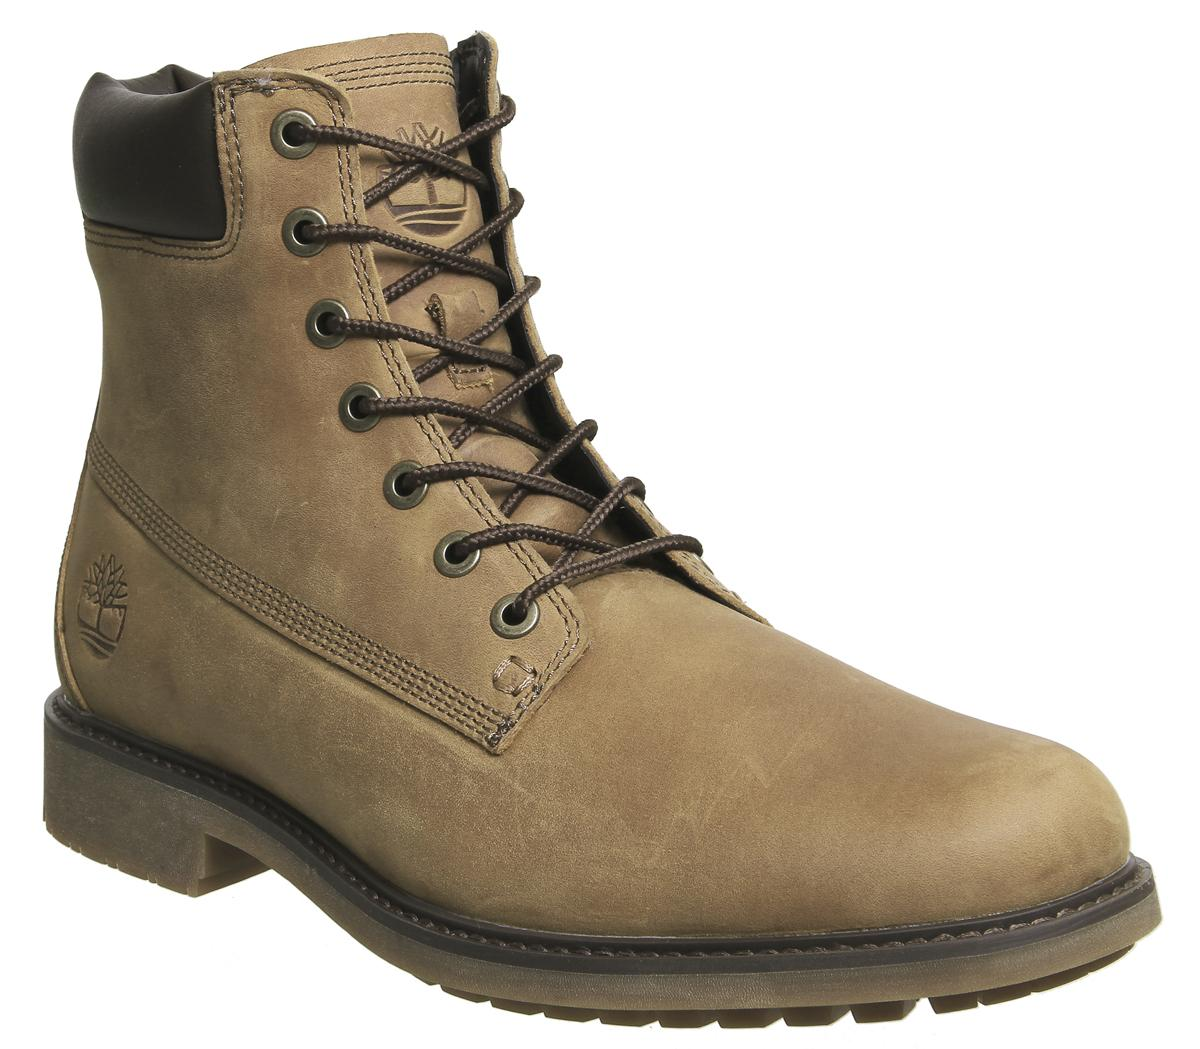 Dr. Martens Coronado Shoe Gaucho Leather Casual